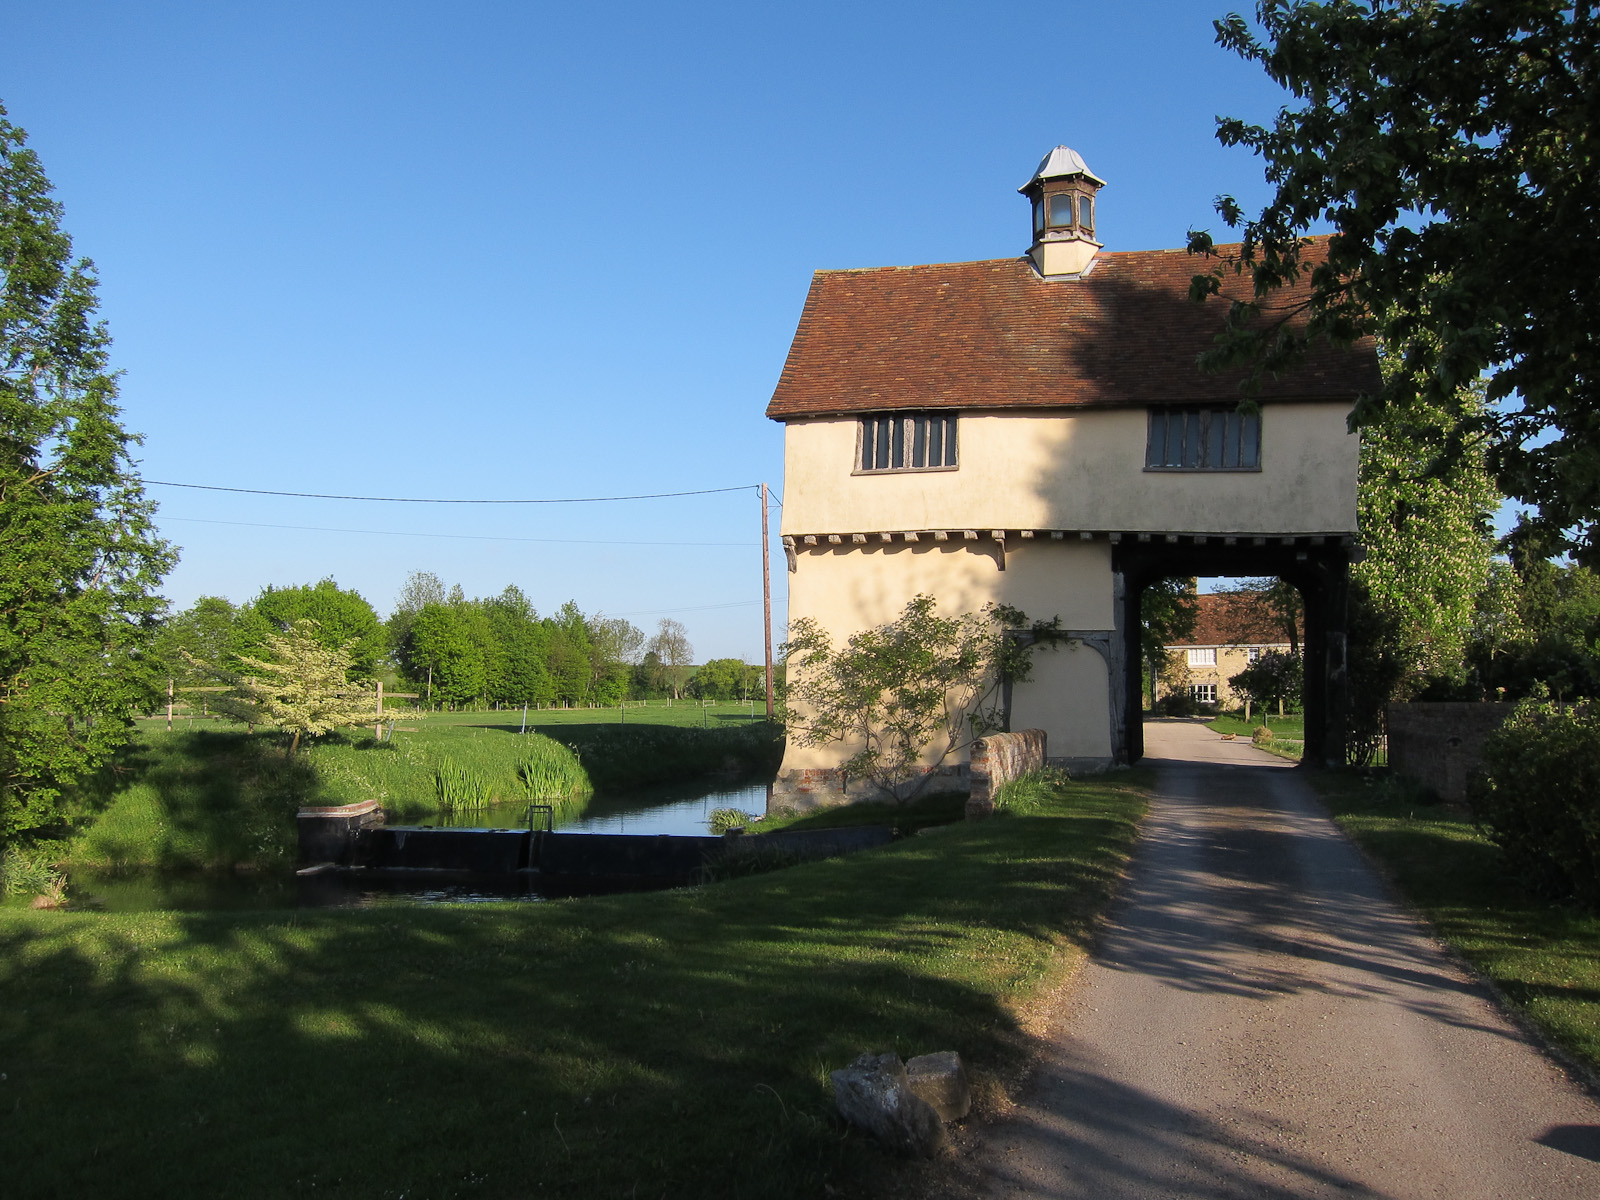 File:Down Hall farm gatehouse-geograph.org.uk-2558541.jpg